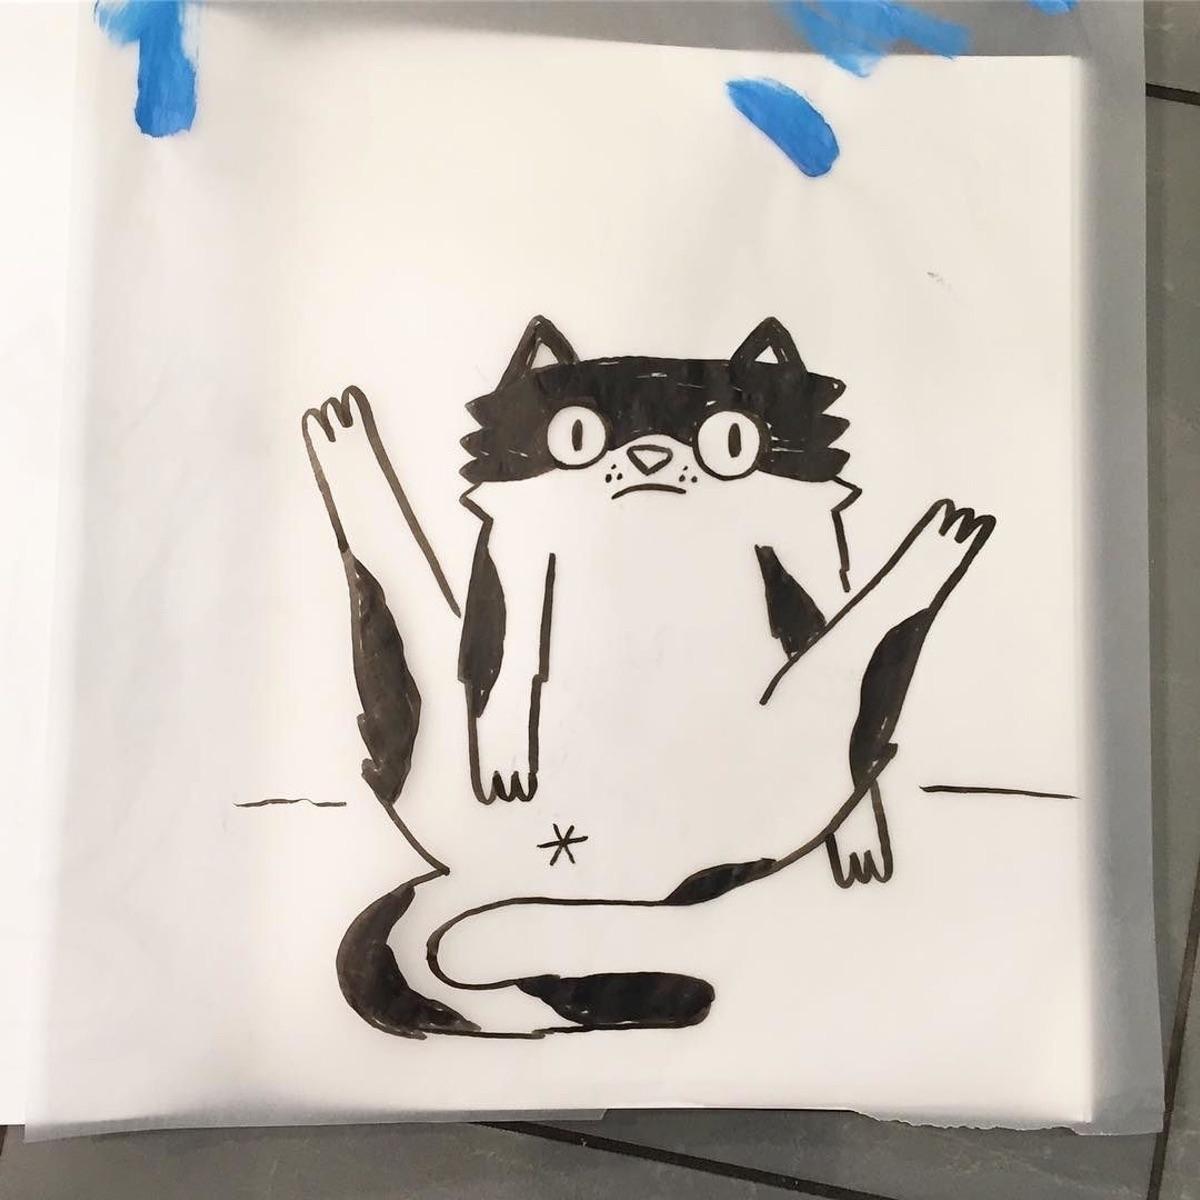 Life drawing artist - talltreesofportland - helliongallery | ello